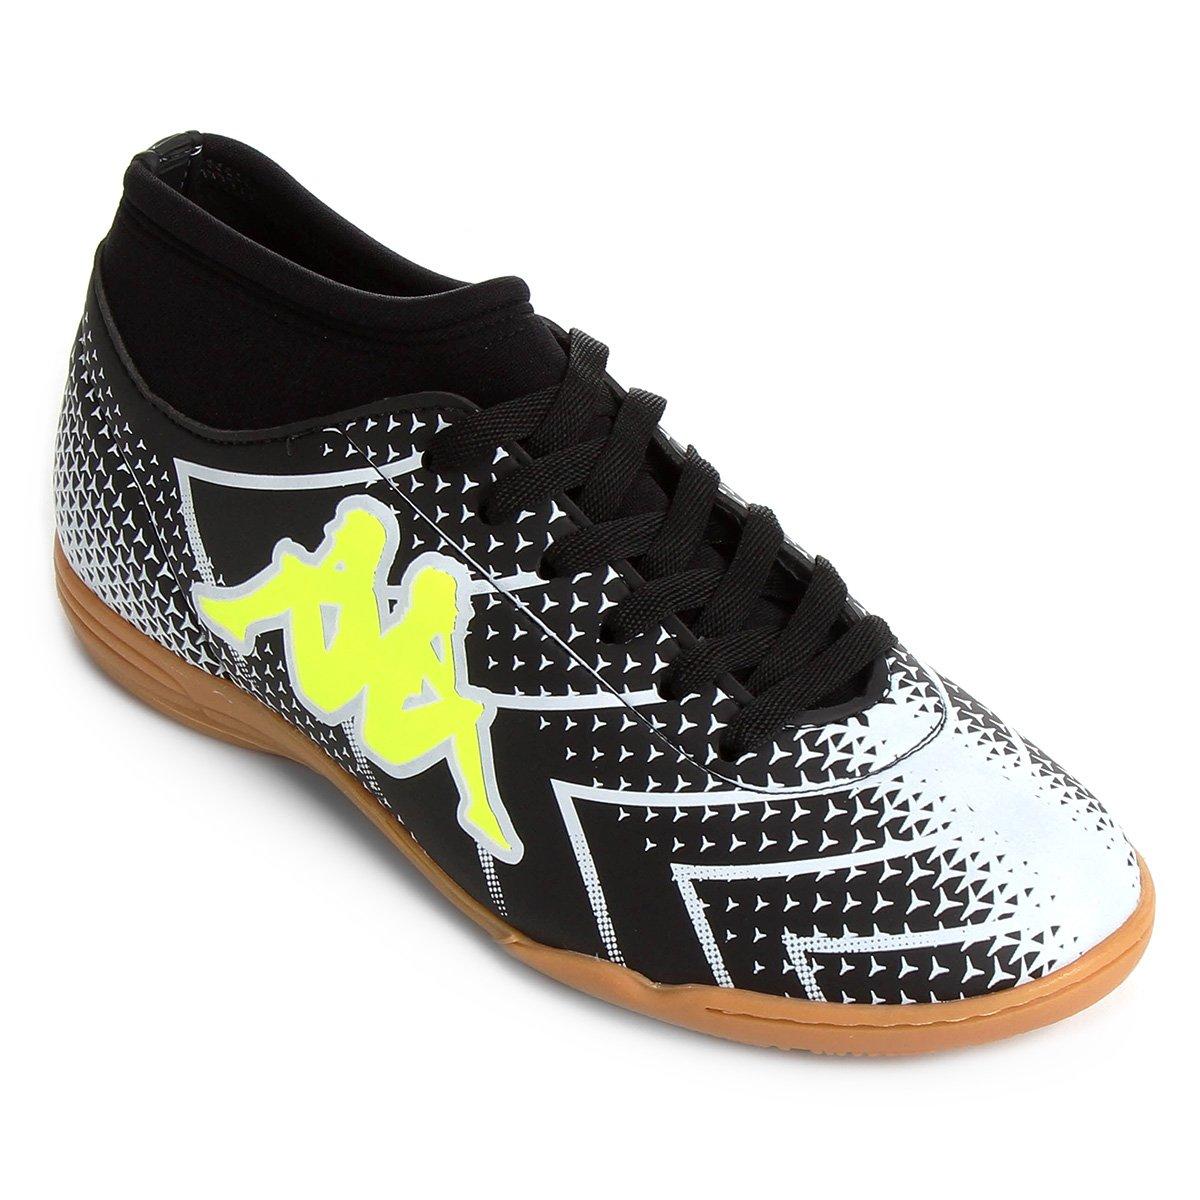 f6aa77c517 Chuteira Futsal Kappa Údine - Preto e Branco - Compre Agora